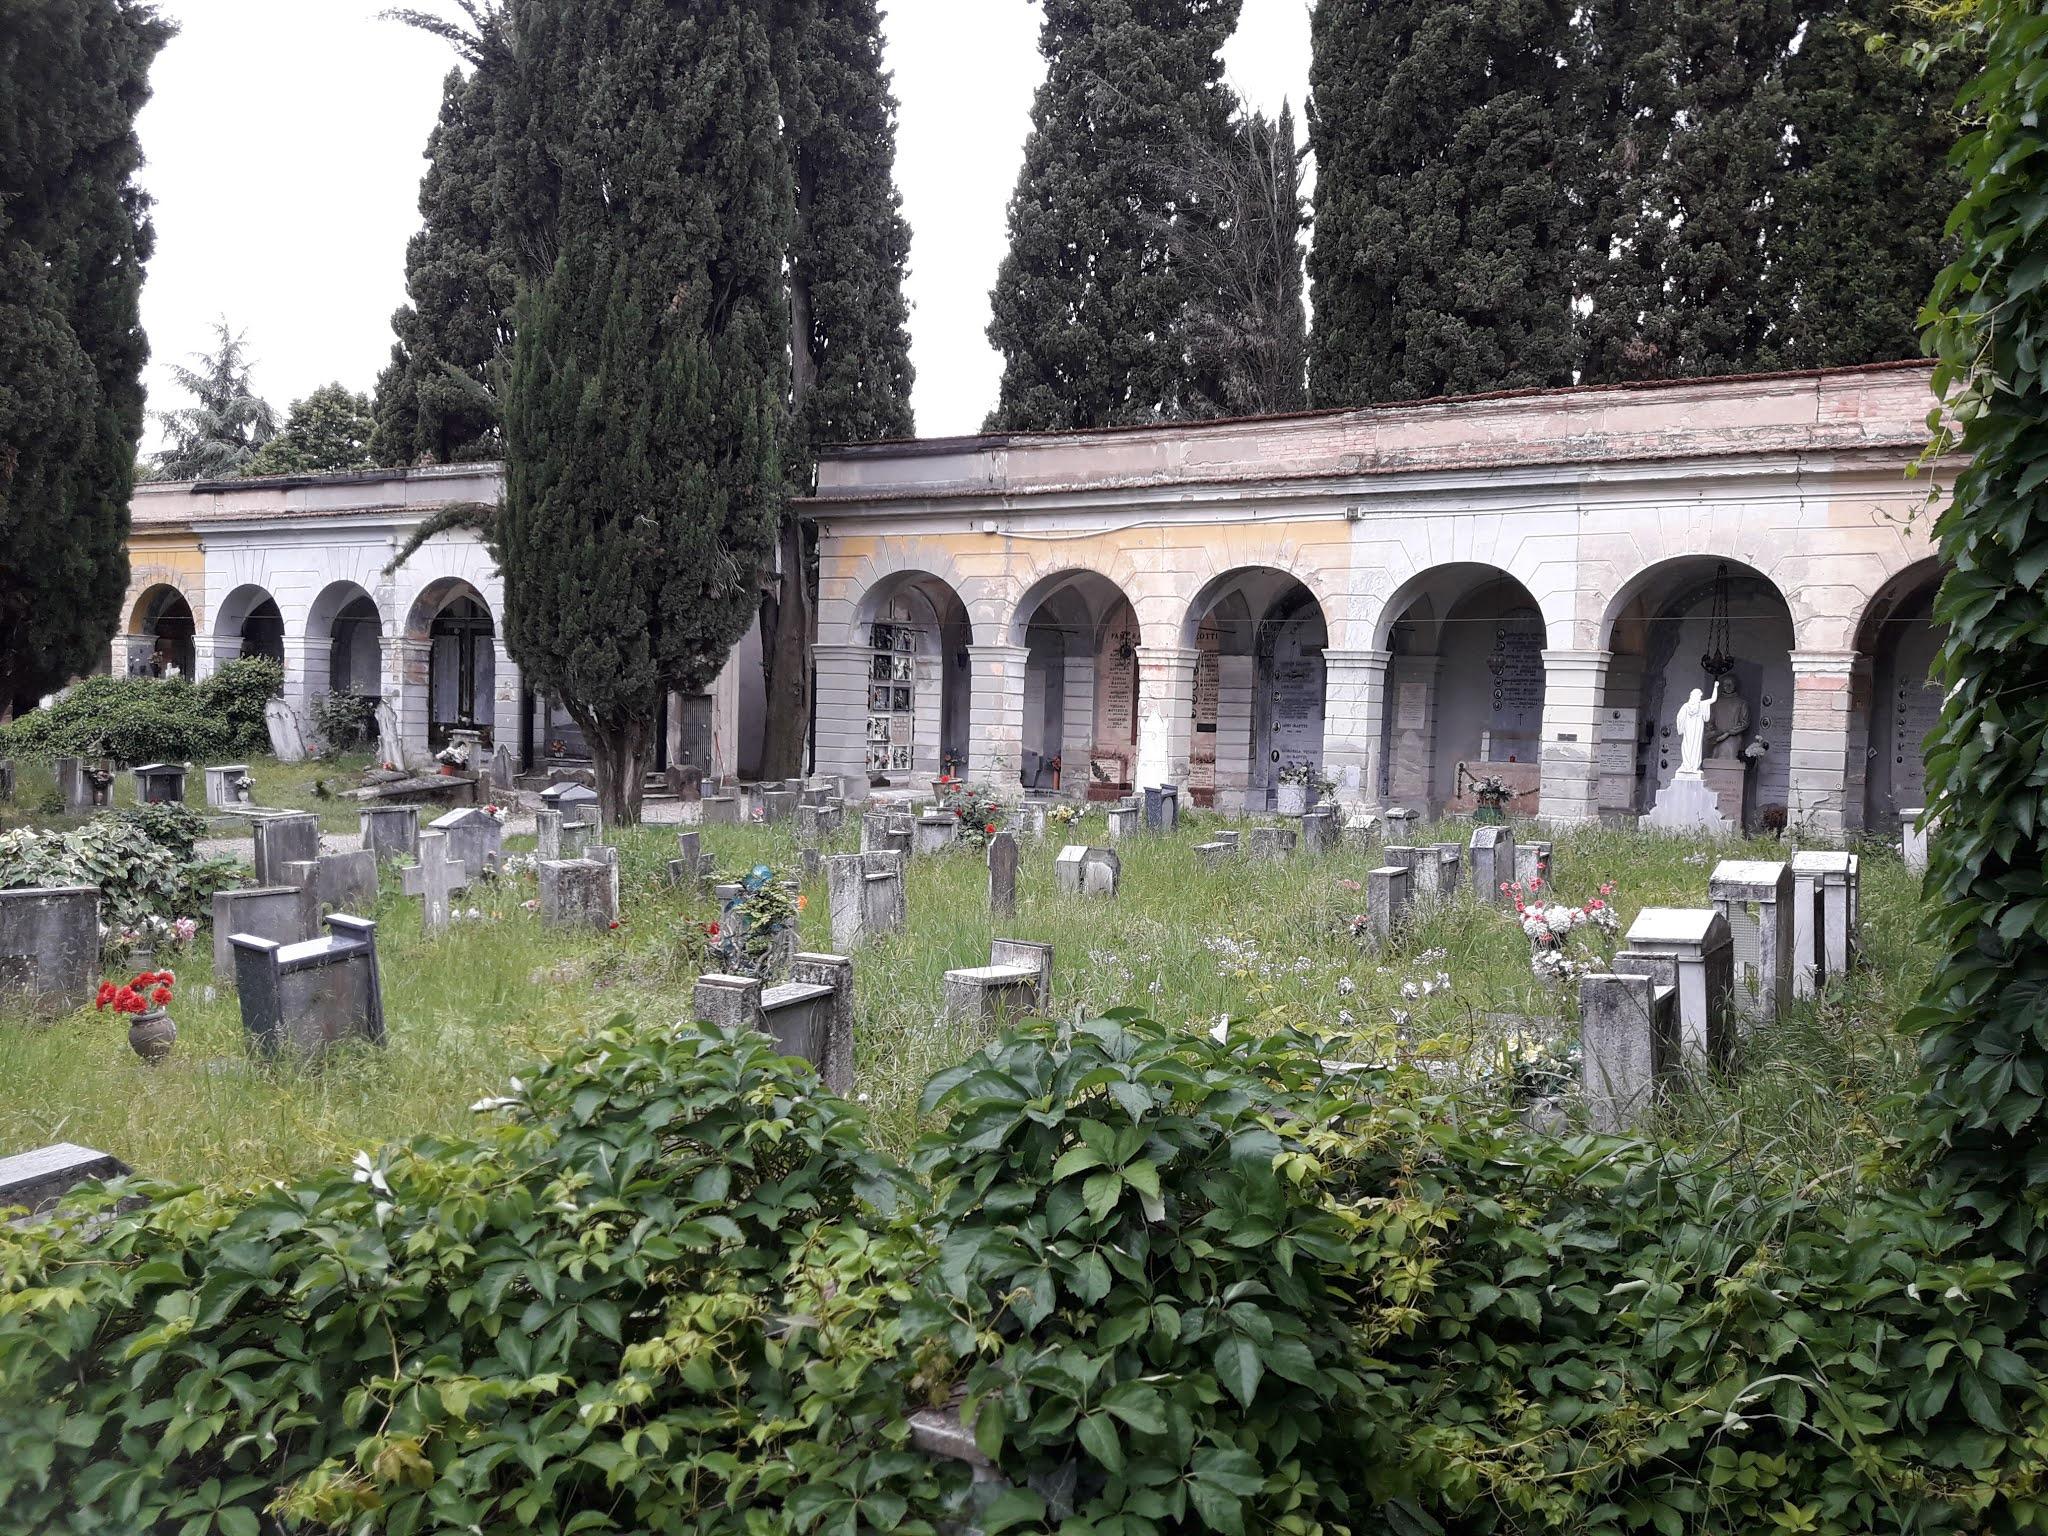 Cemetery of San Prospero (Sassuolo, Italy)